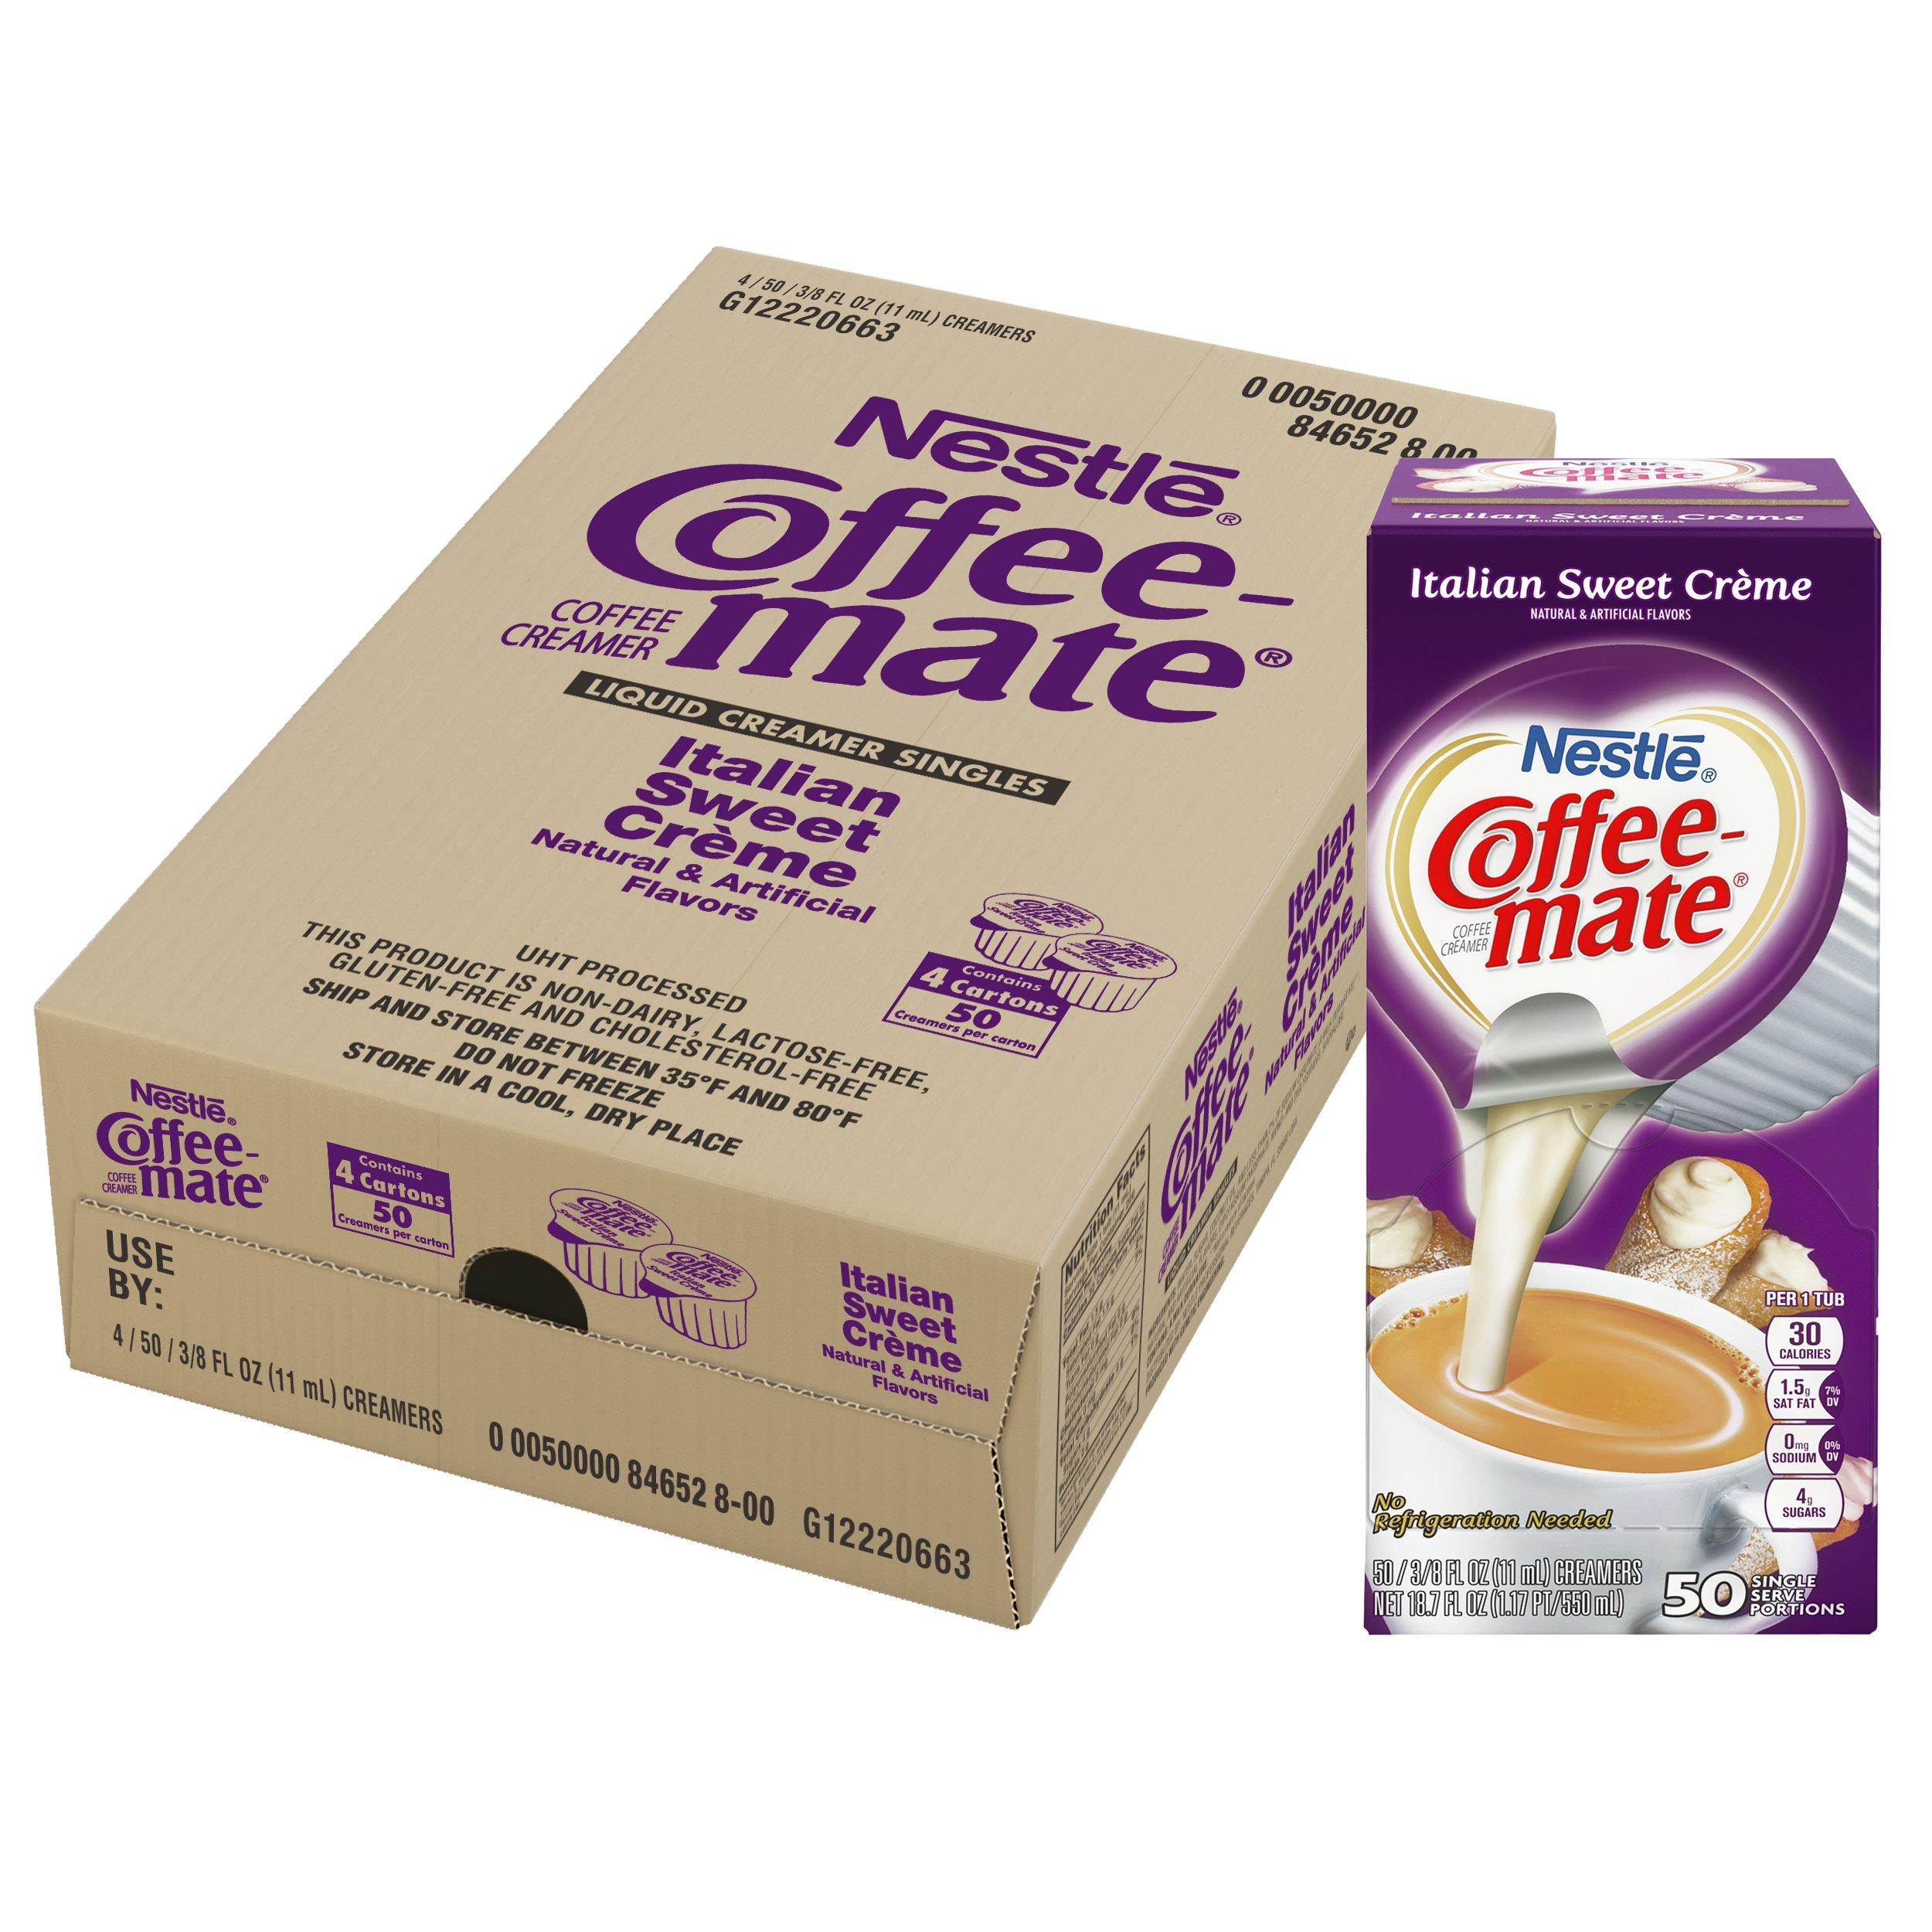 NESTLE COFFEE-MATE Coffee Creamer, Italian Sweet Creme, liquid creamer singles, Pack of 200 by Nestle Coffee Mate (Image #6)